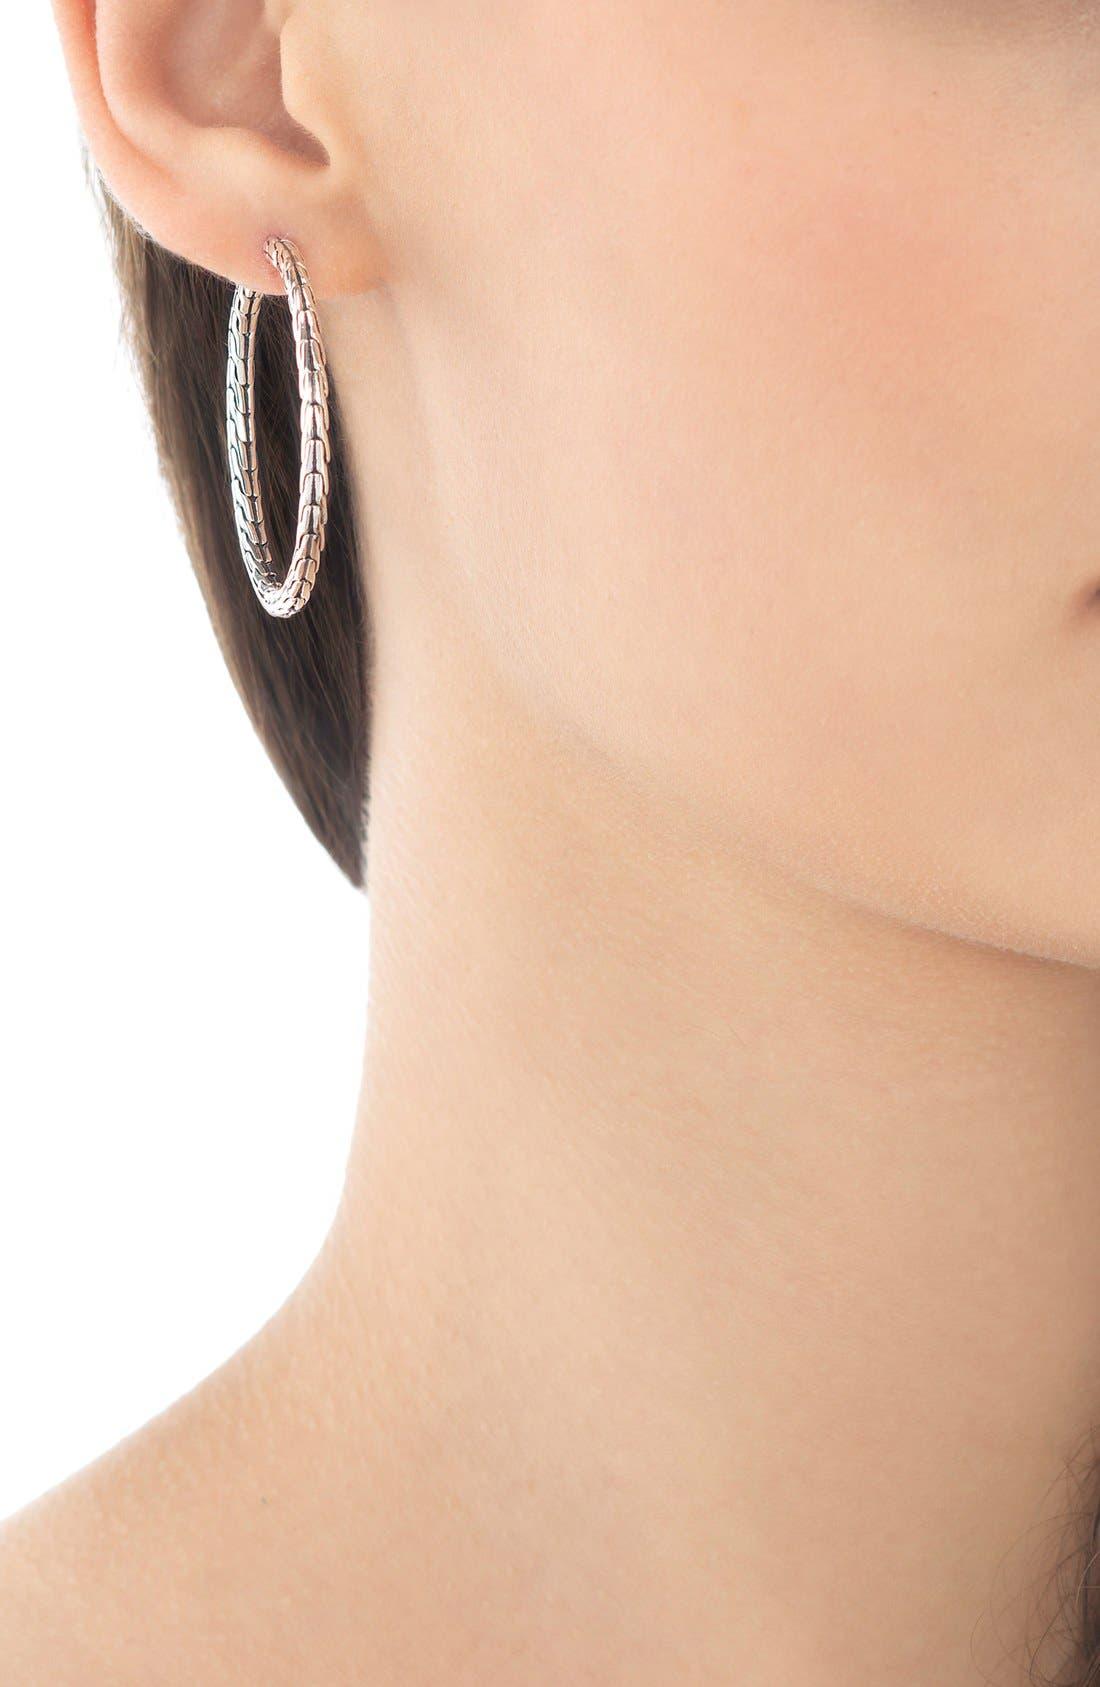 Alternate Image 2  - John Hardy 'Classic Chain' Medium Hoop Earrings